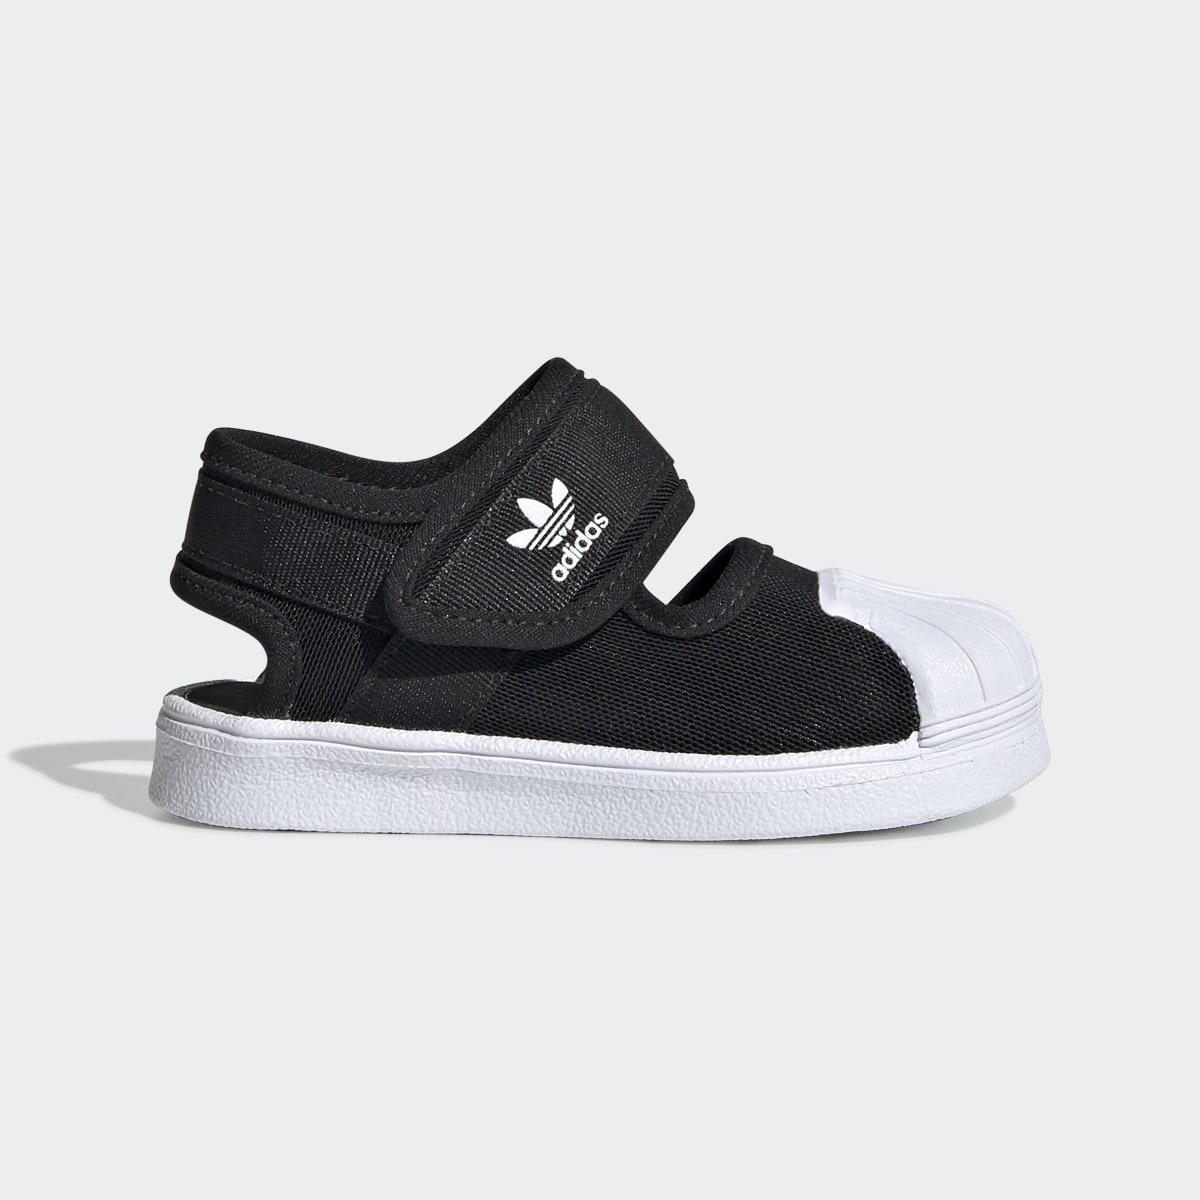 Superstar 360 Sandals